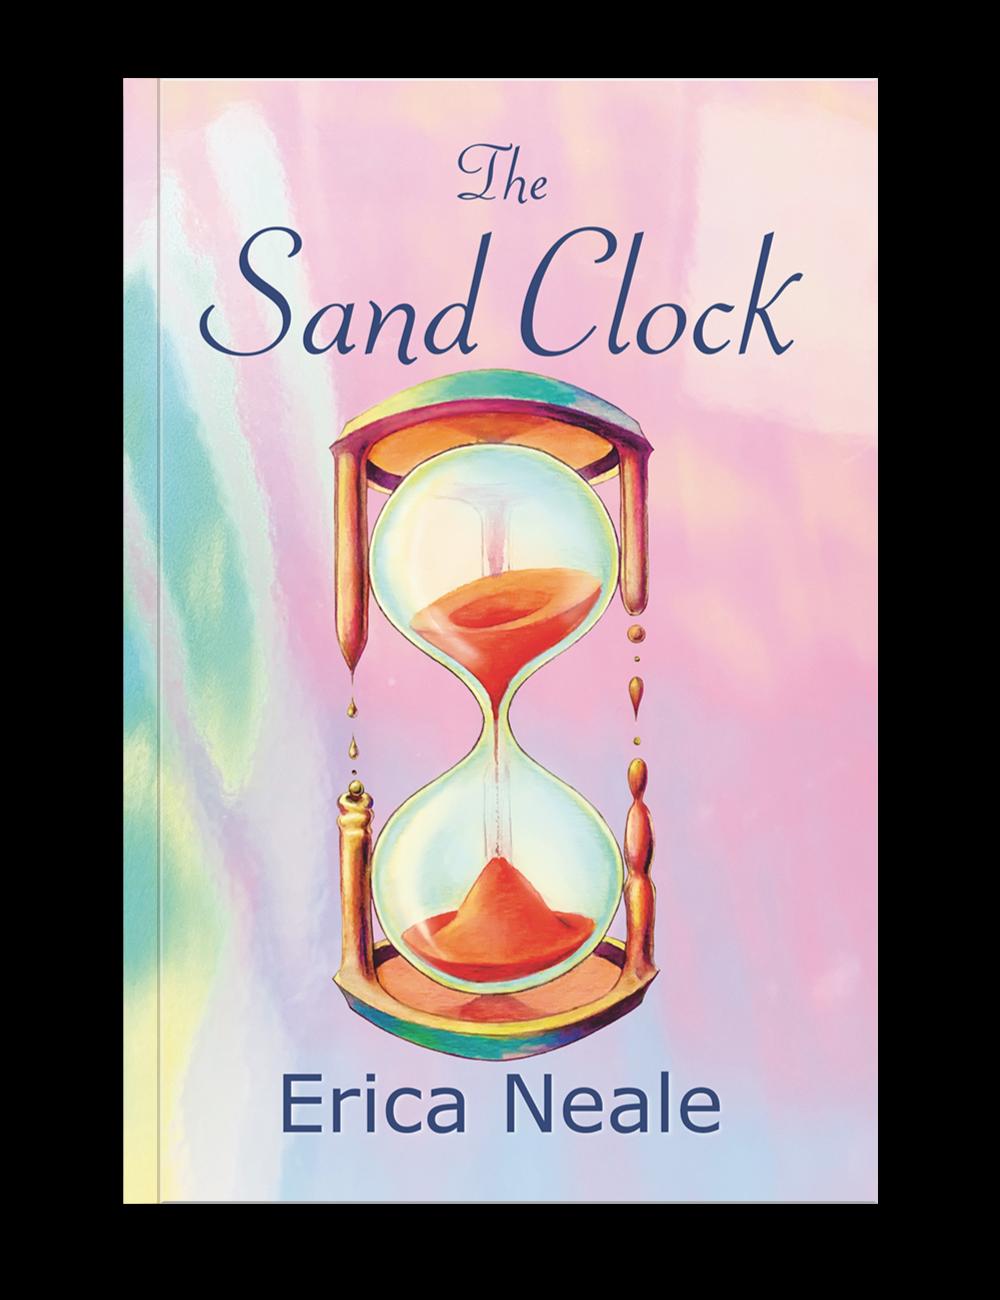 The Sand Clock